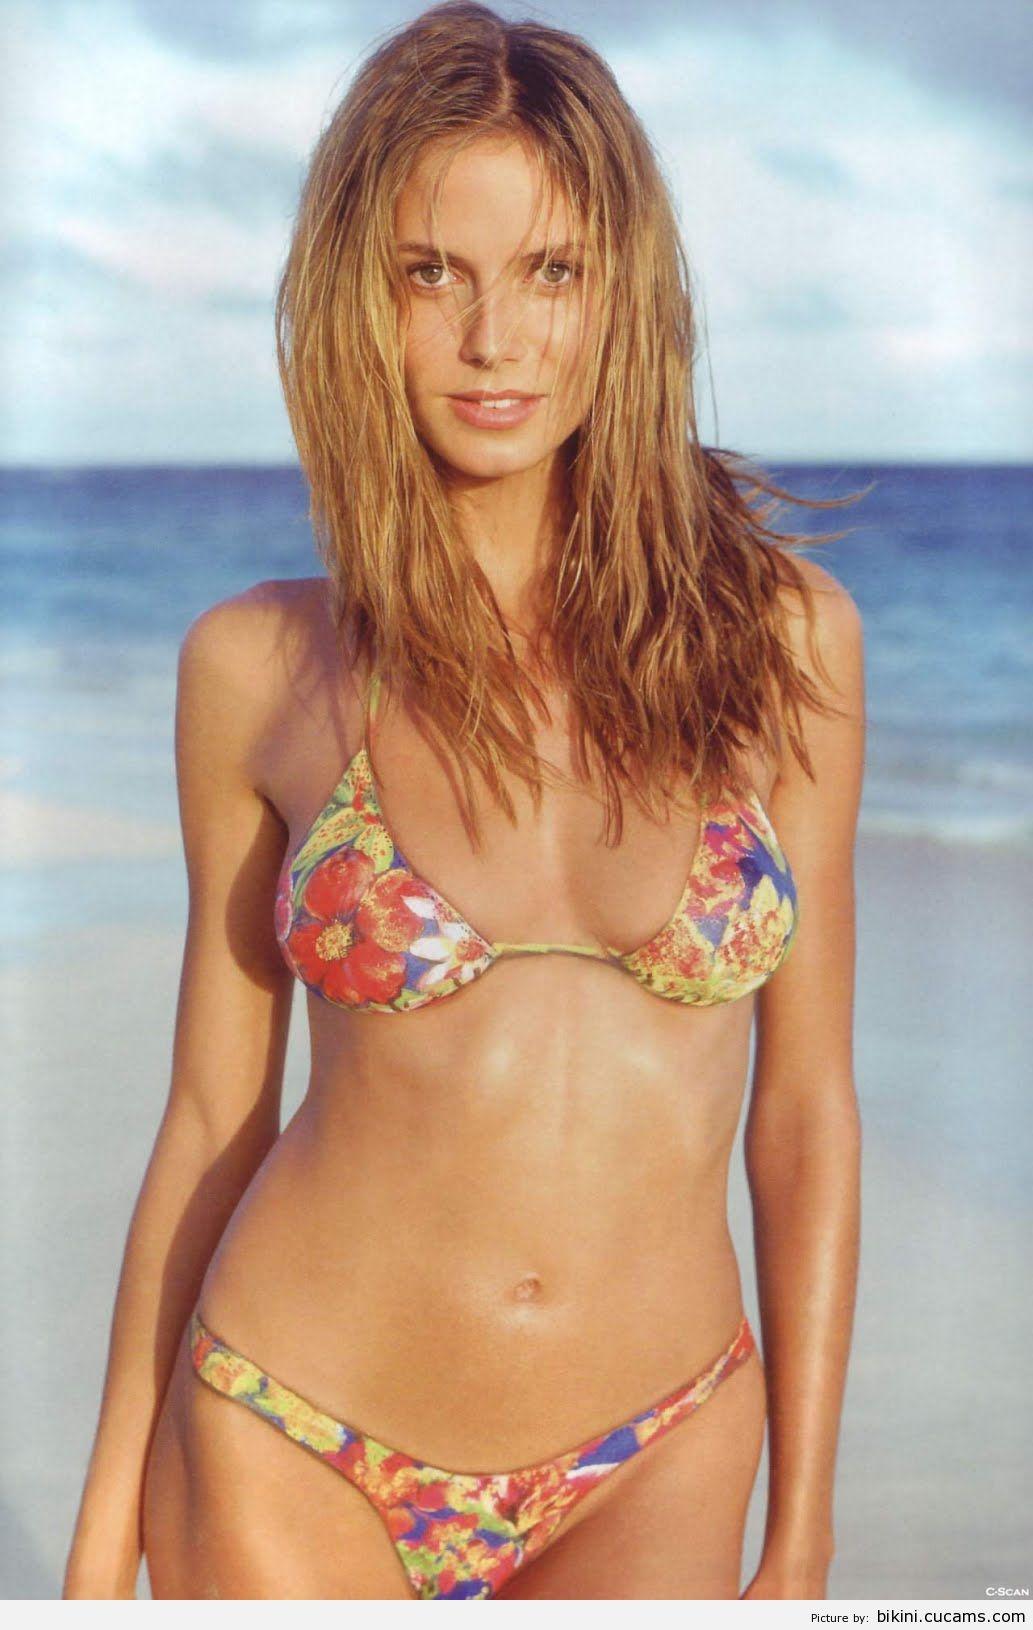 Bikini Plumber Tickling by bikini.cucams.com